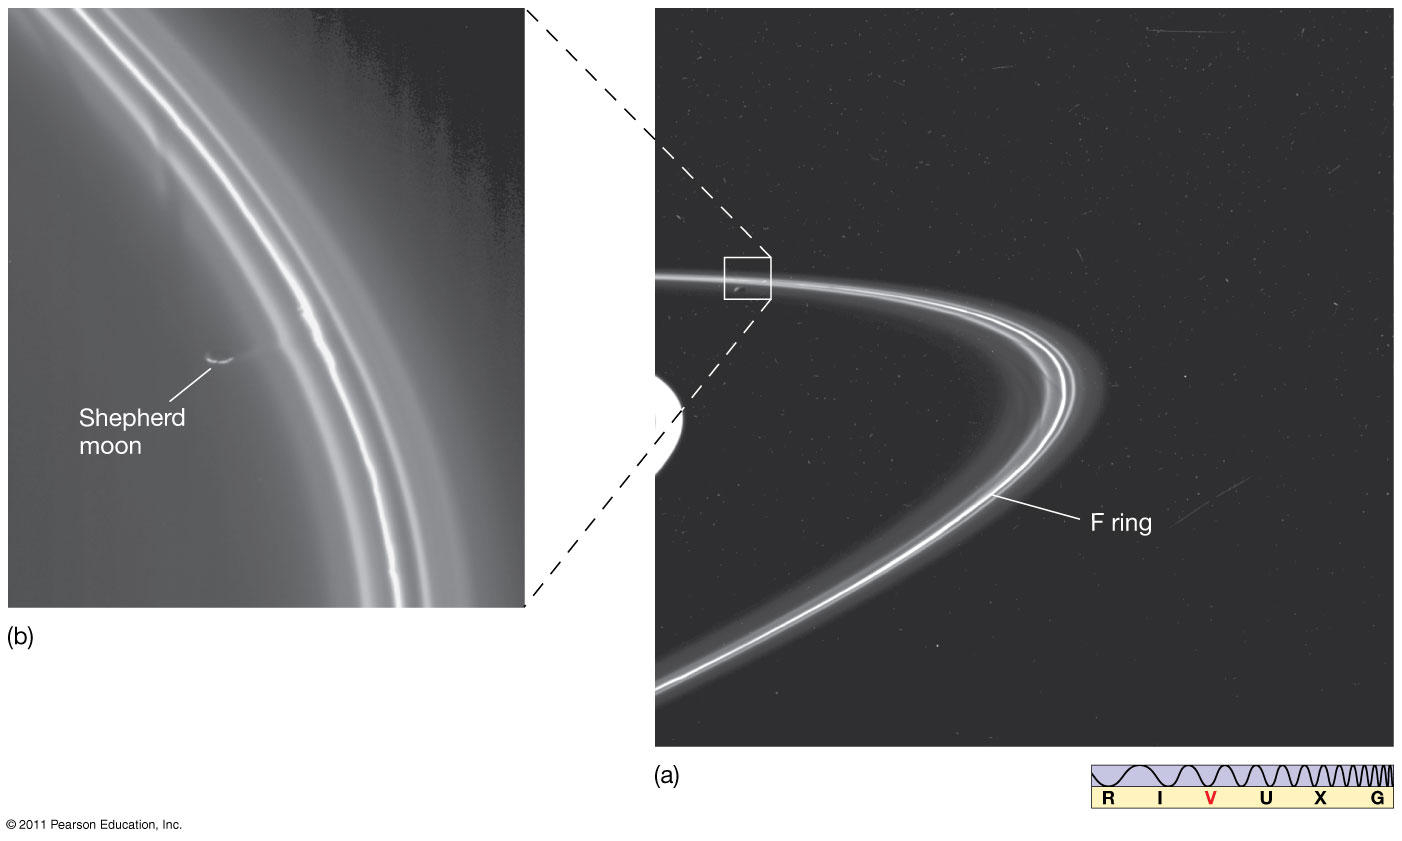 pandora planets aligned - photo #2